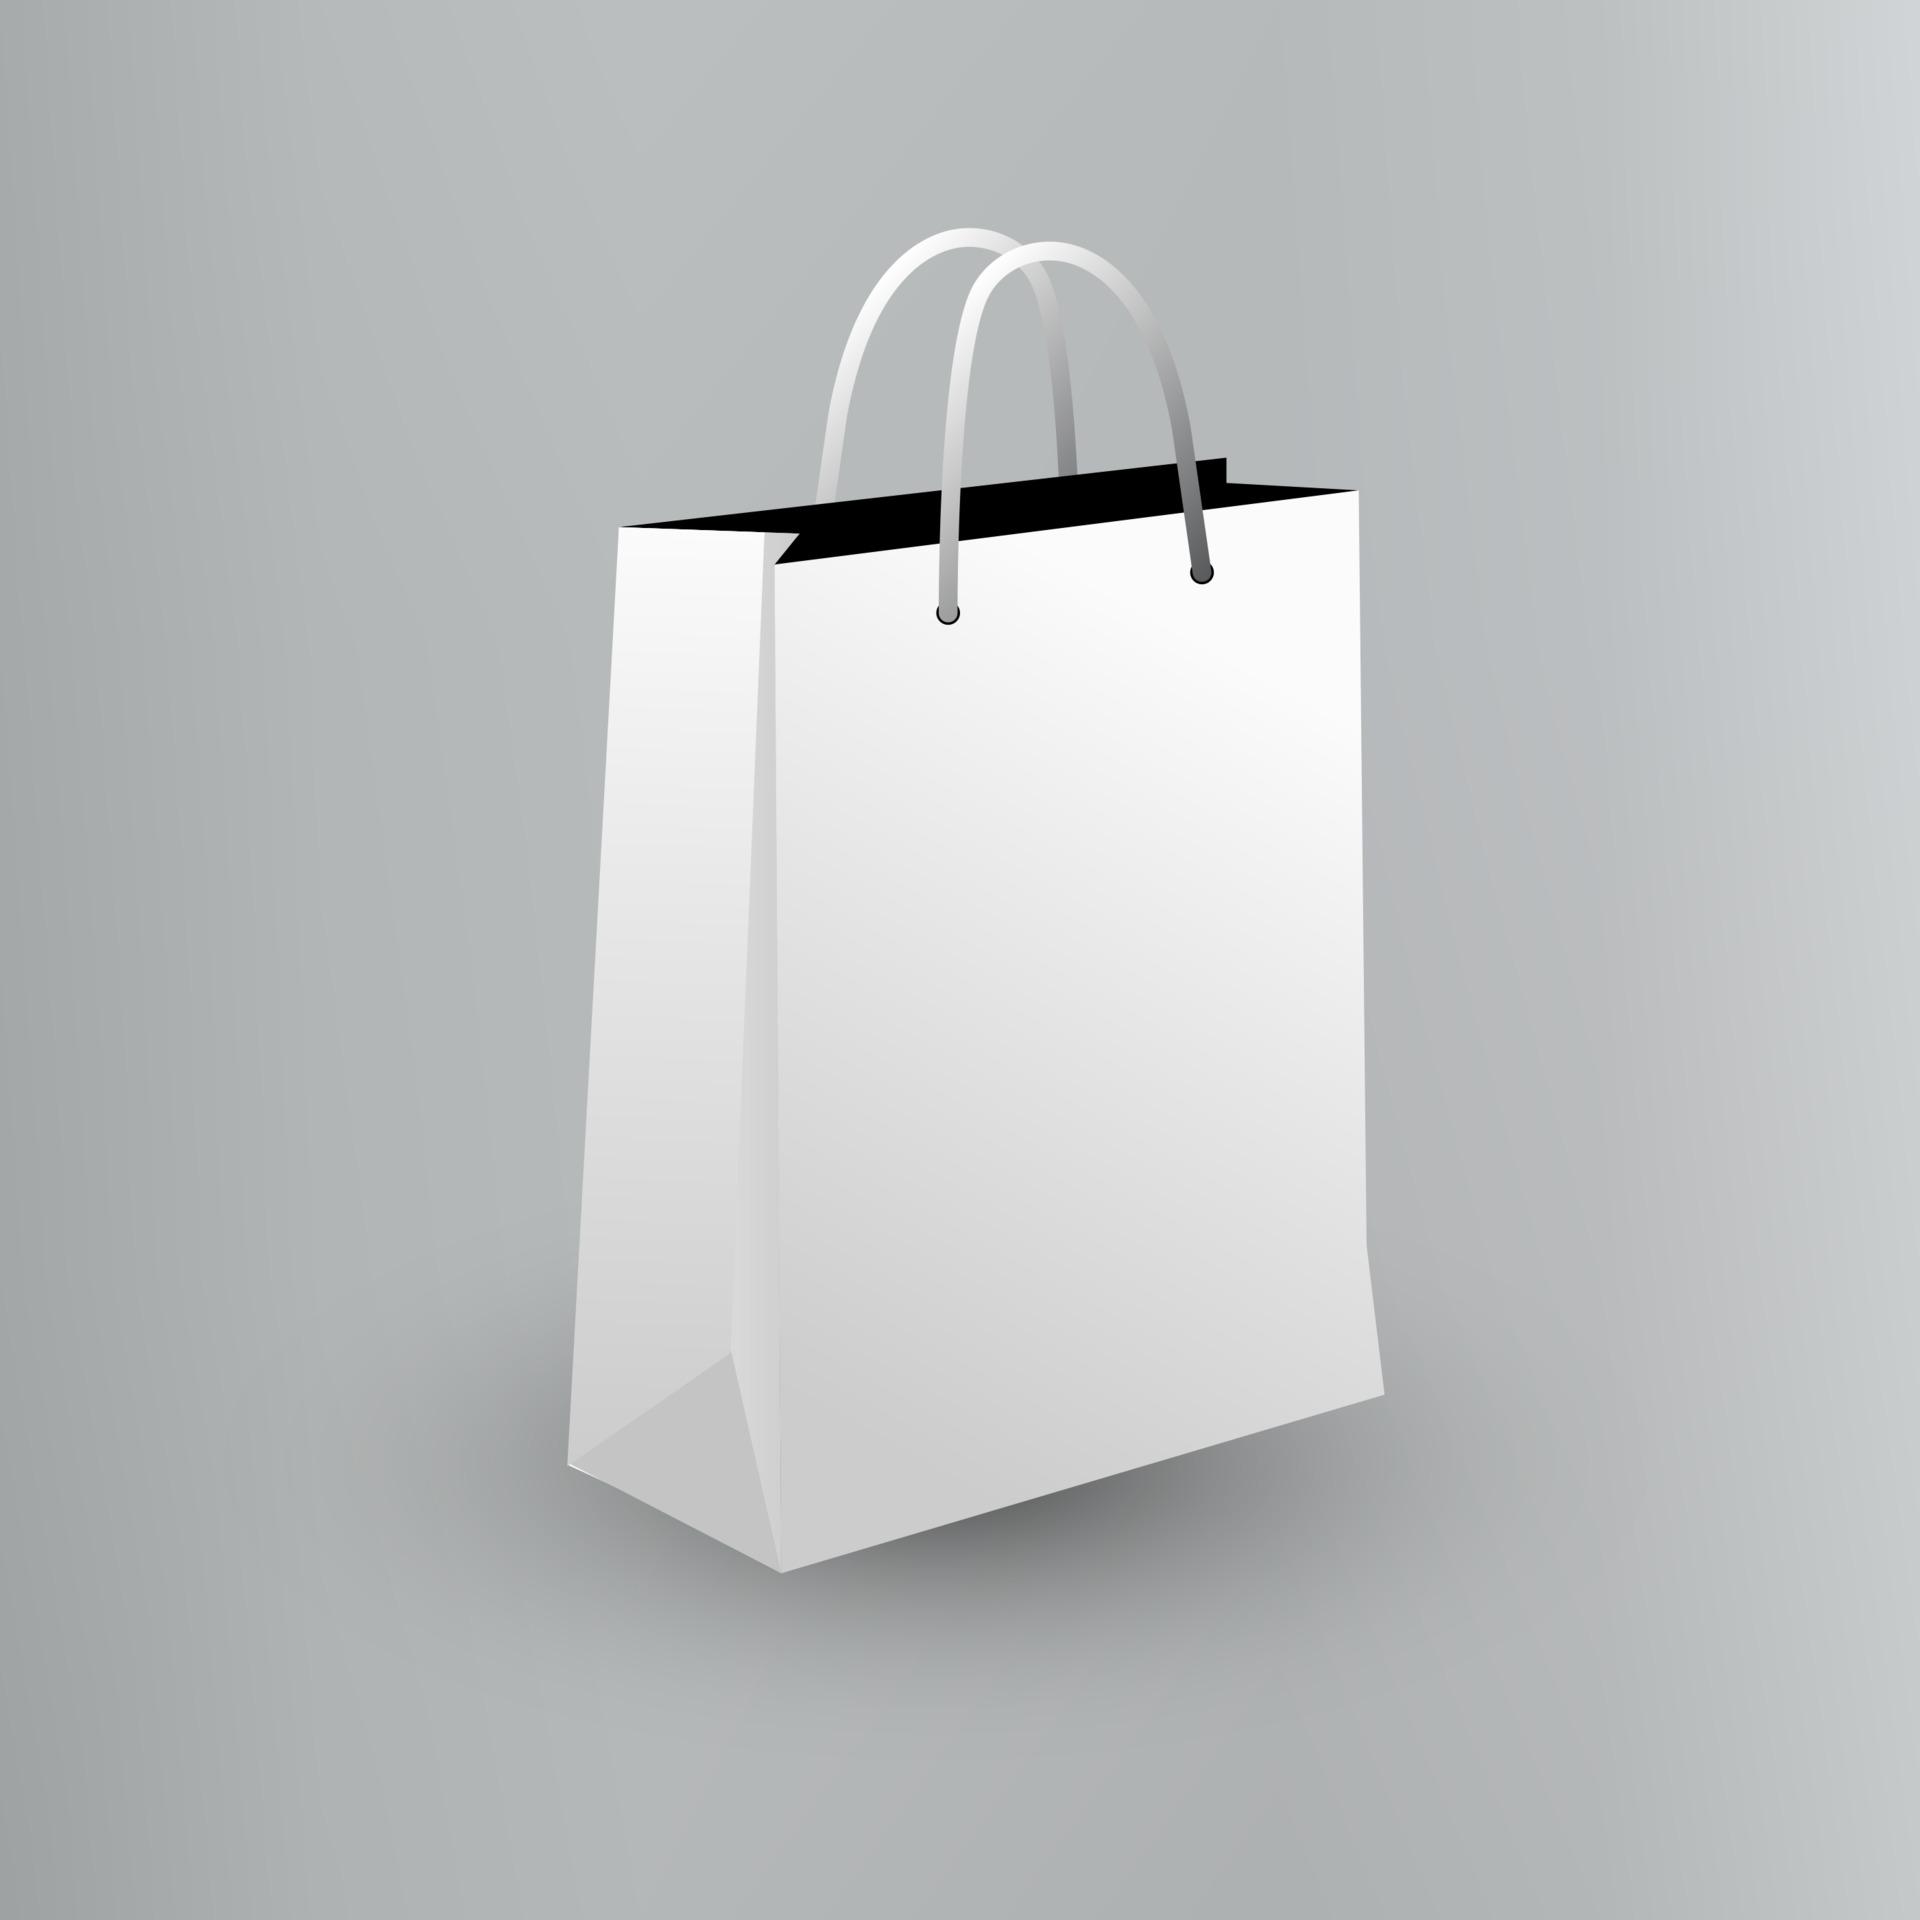 Snack product packing vector eps10 kraft paper takeaway bag mockup in vector. Empty Shopping Bag Mockup Design Template 2089575 Vector Art At Vecteezy